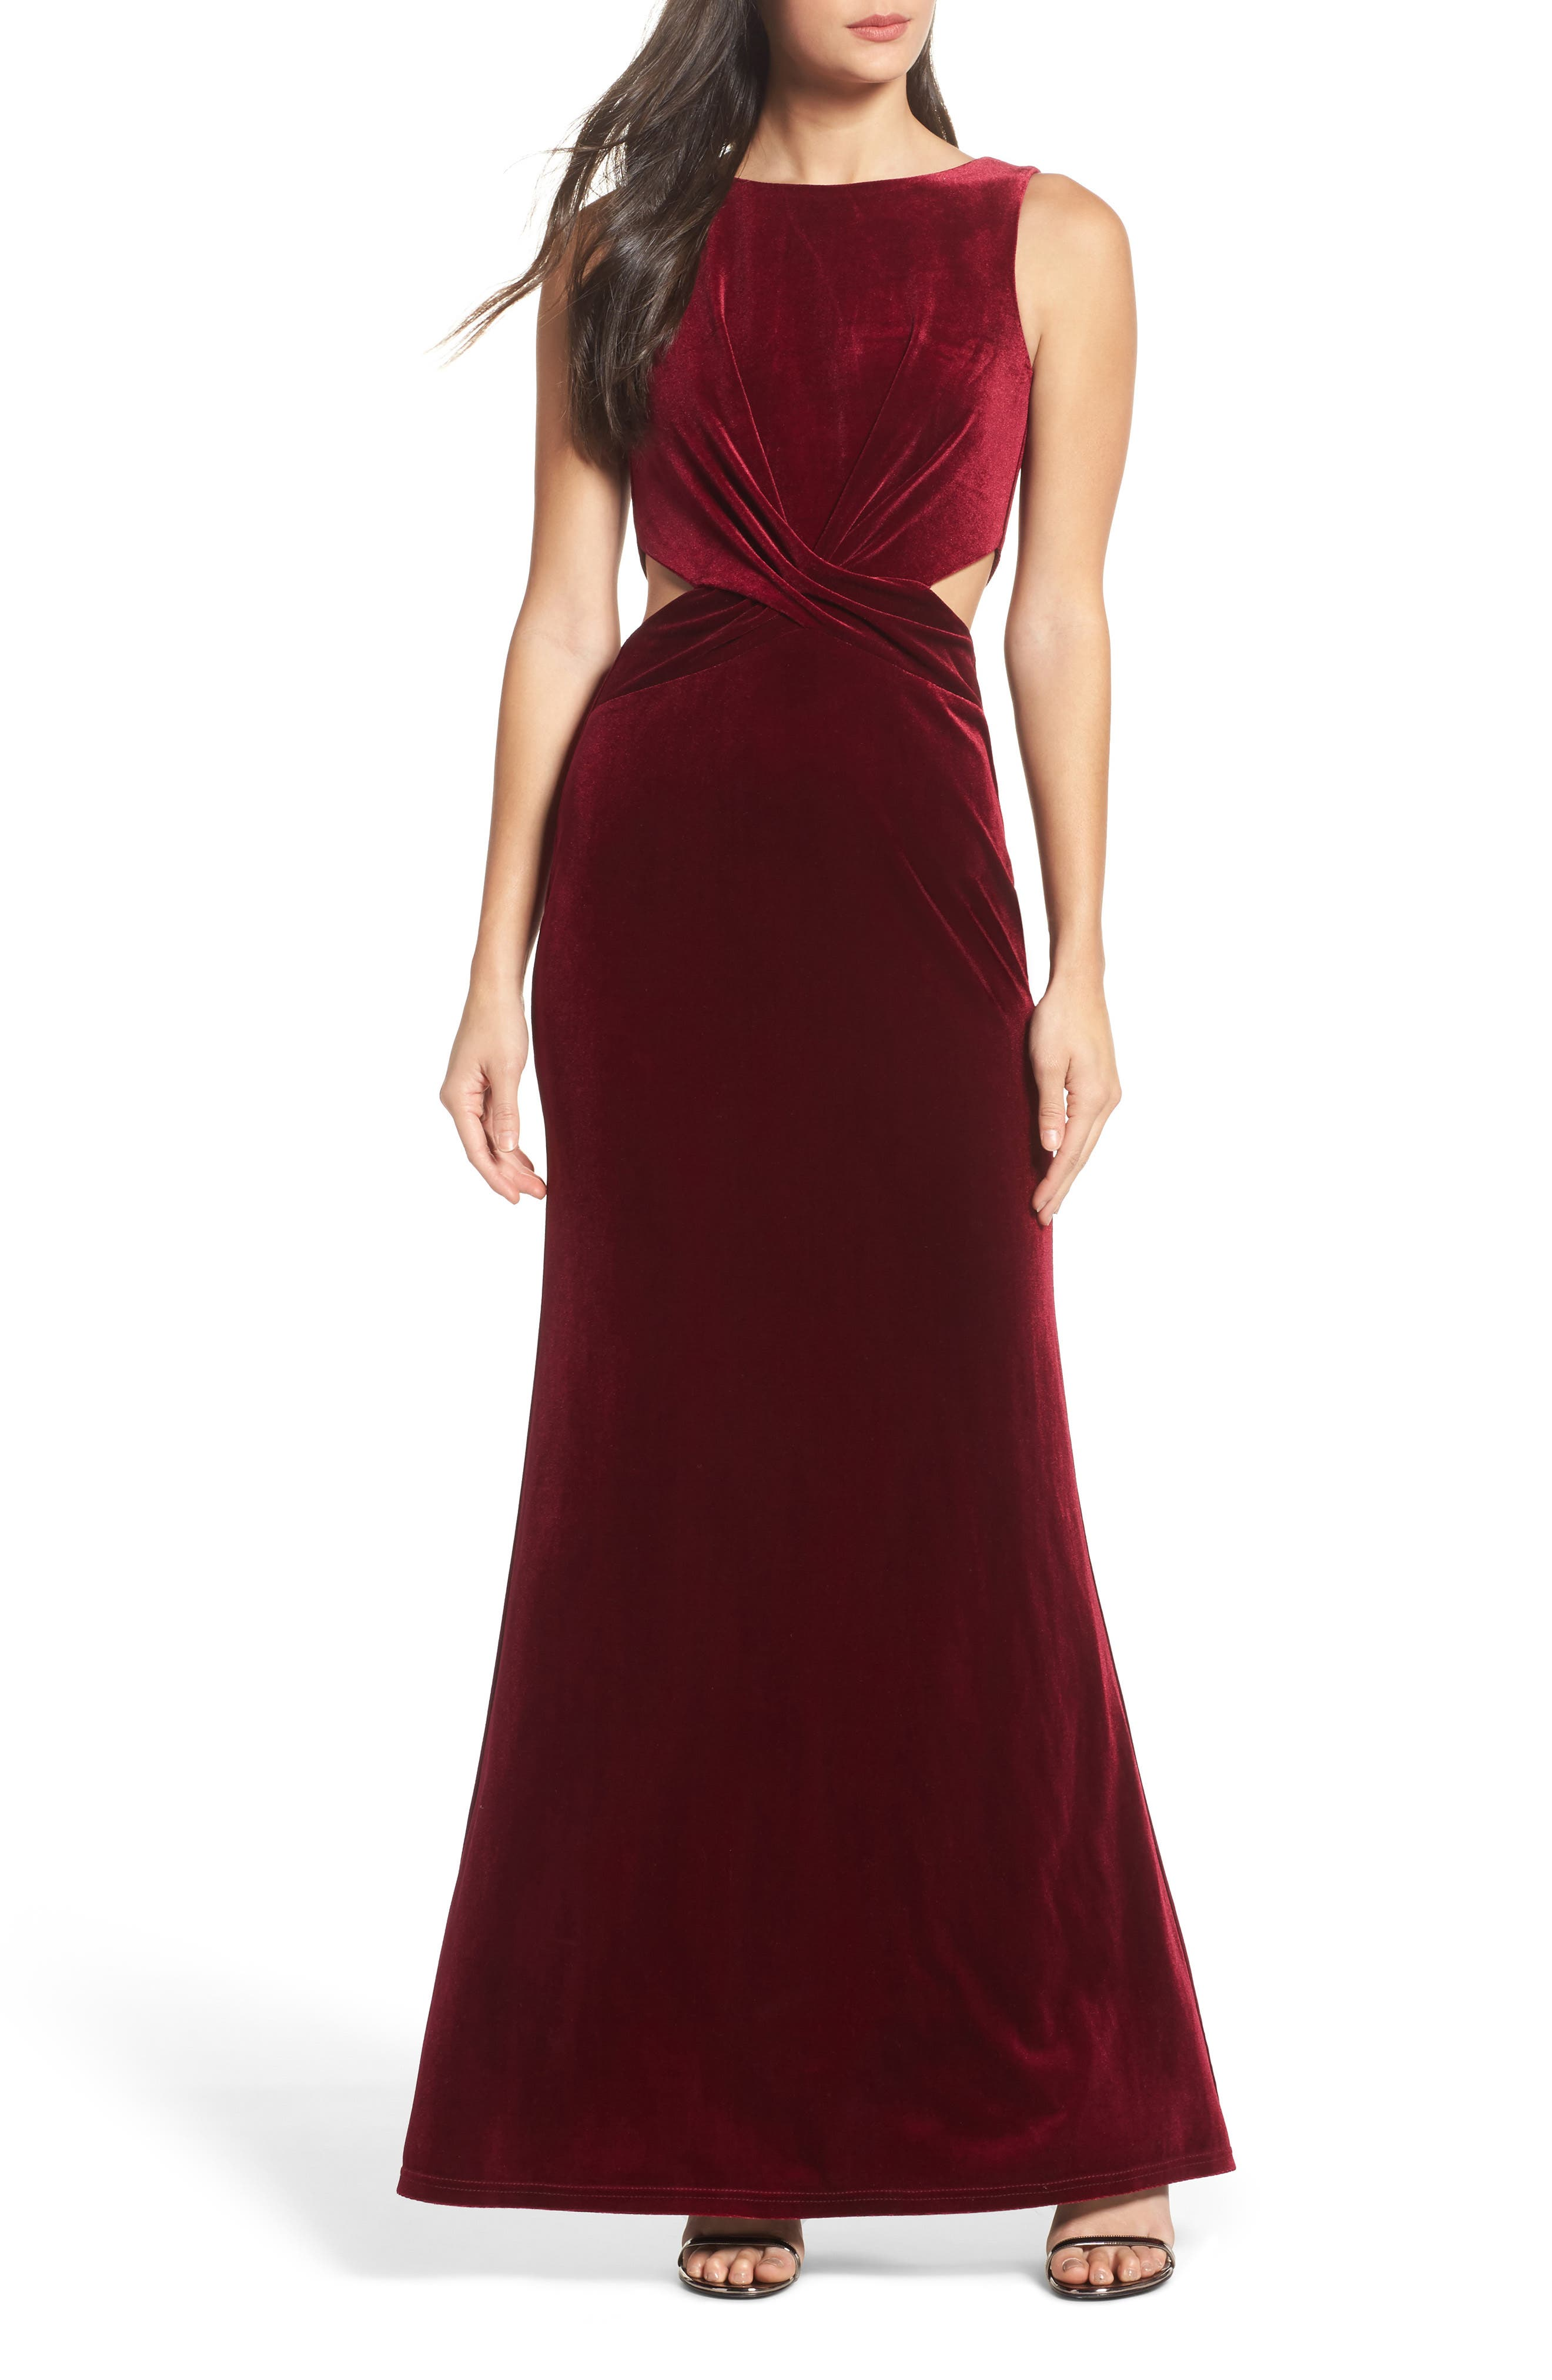 Main Image - Lulus Reach Out Velvet Maxi Dress